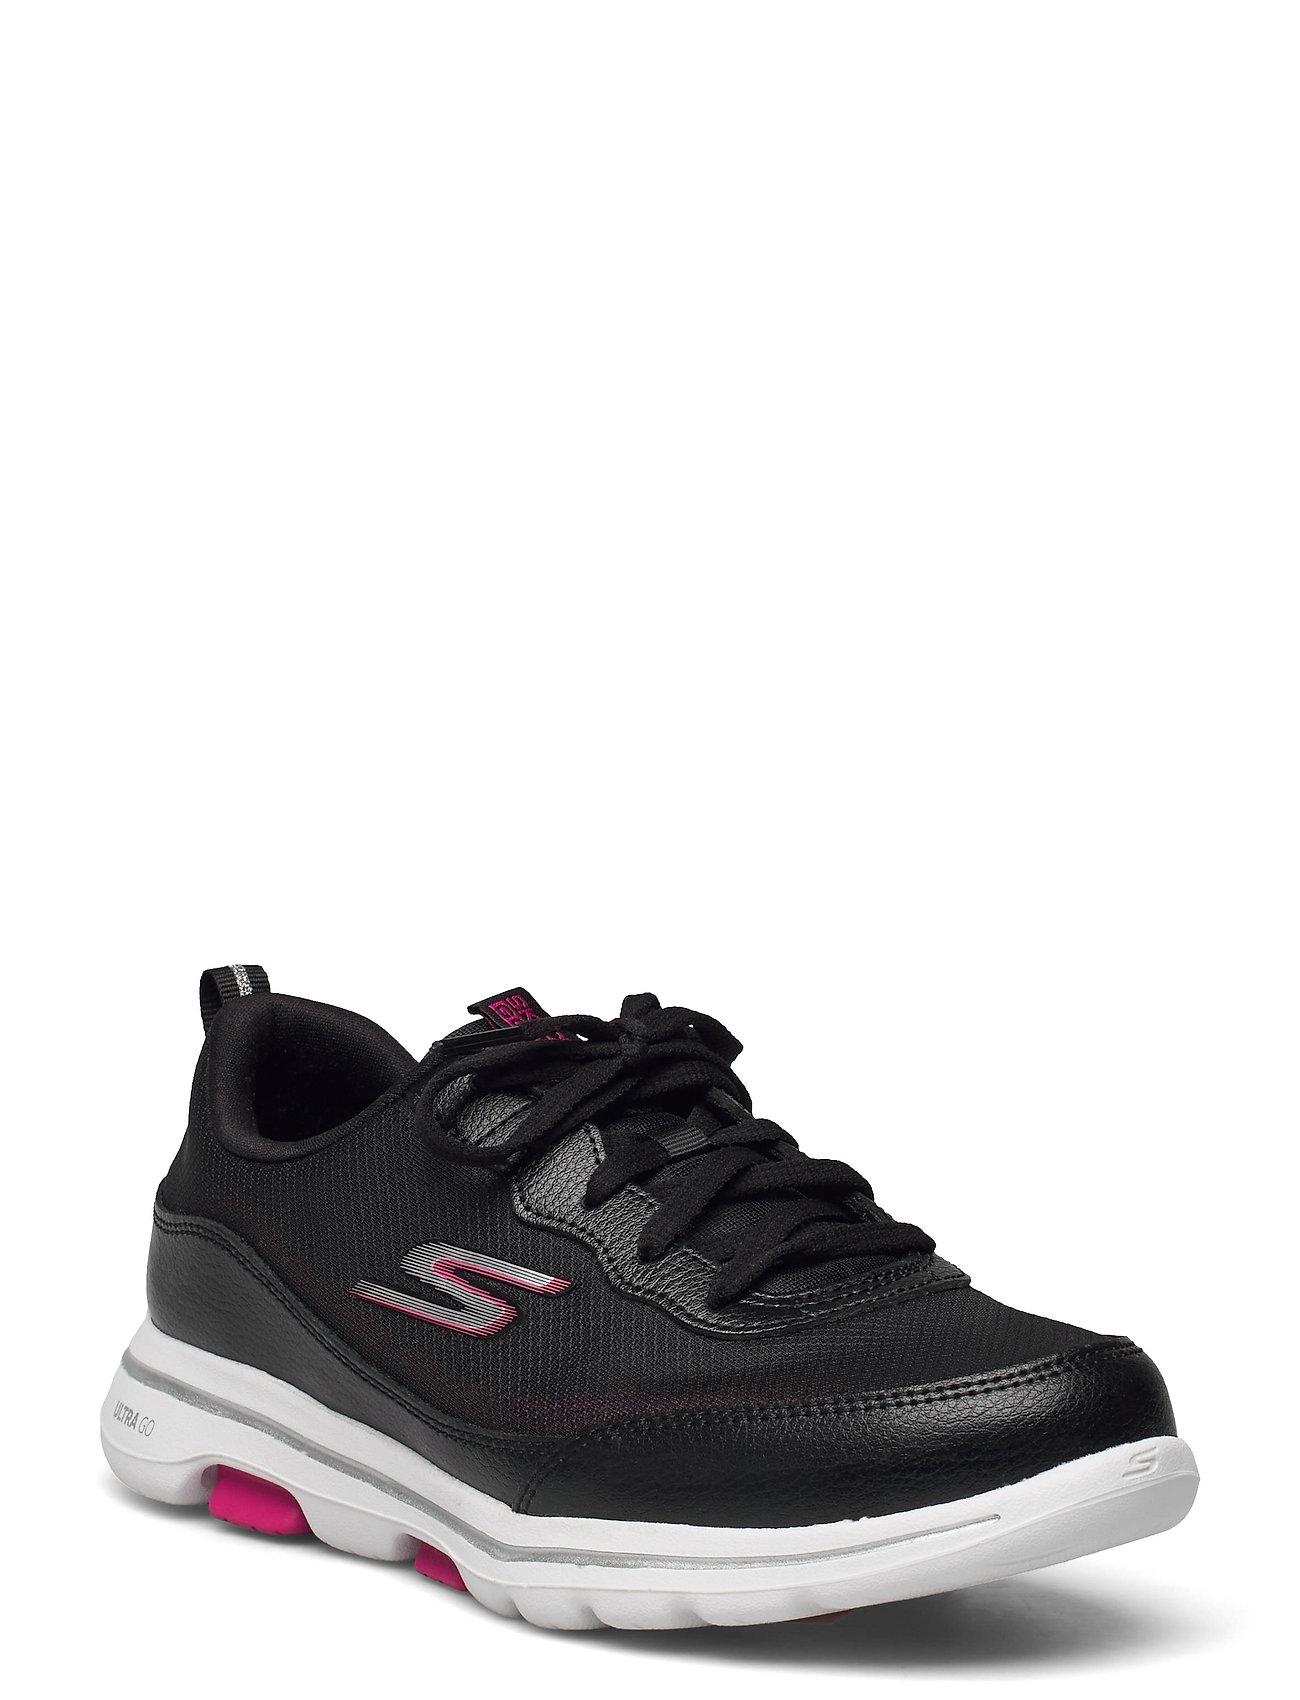 Womens Go Walk 5 - Perfect Step Low-top Sneakers Sort Skechers